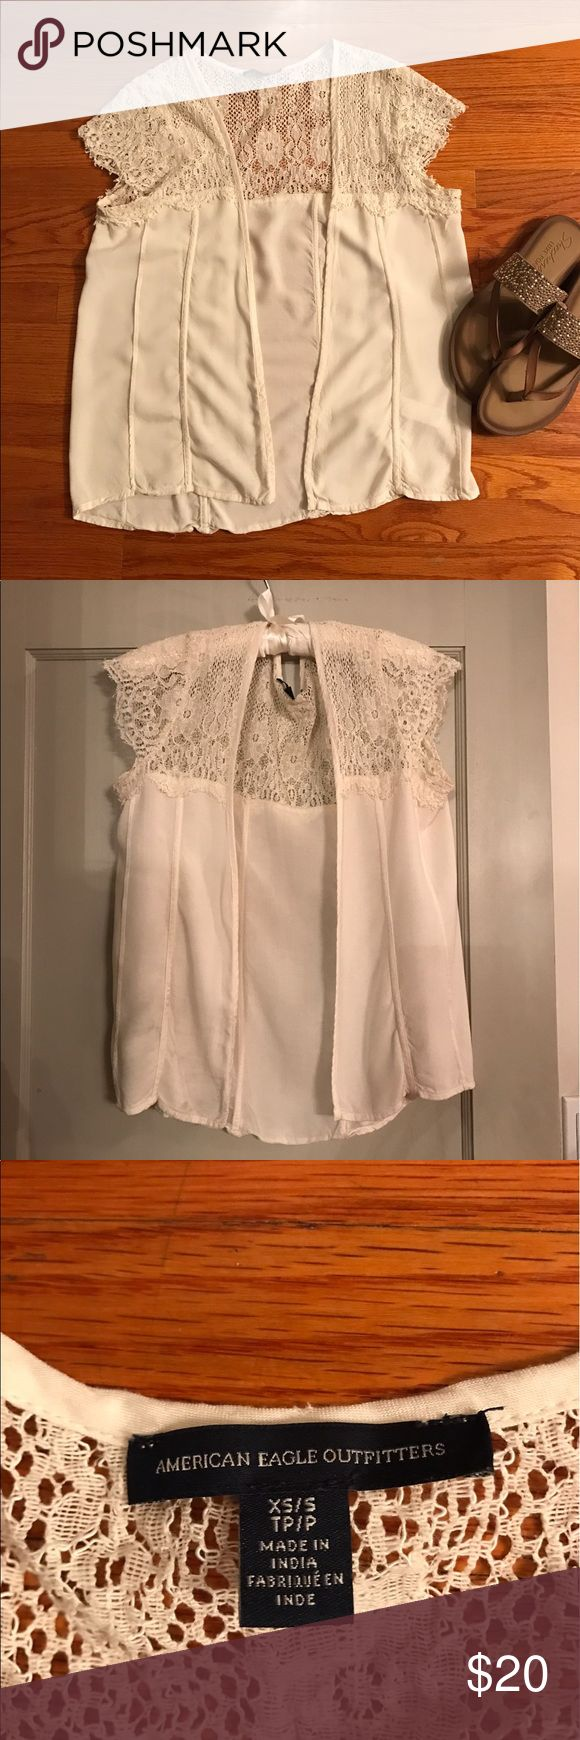 American Eagle Outfitters White Lace Kimono Really cute American Eagle Outfitters off white lace kimono.  Size small but really more like a medium. American Eagle Outfitters Tops